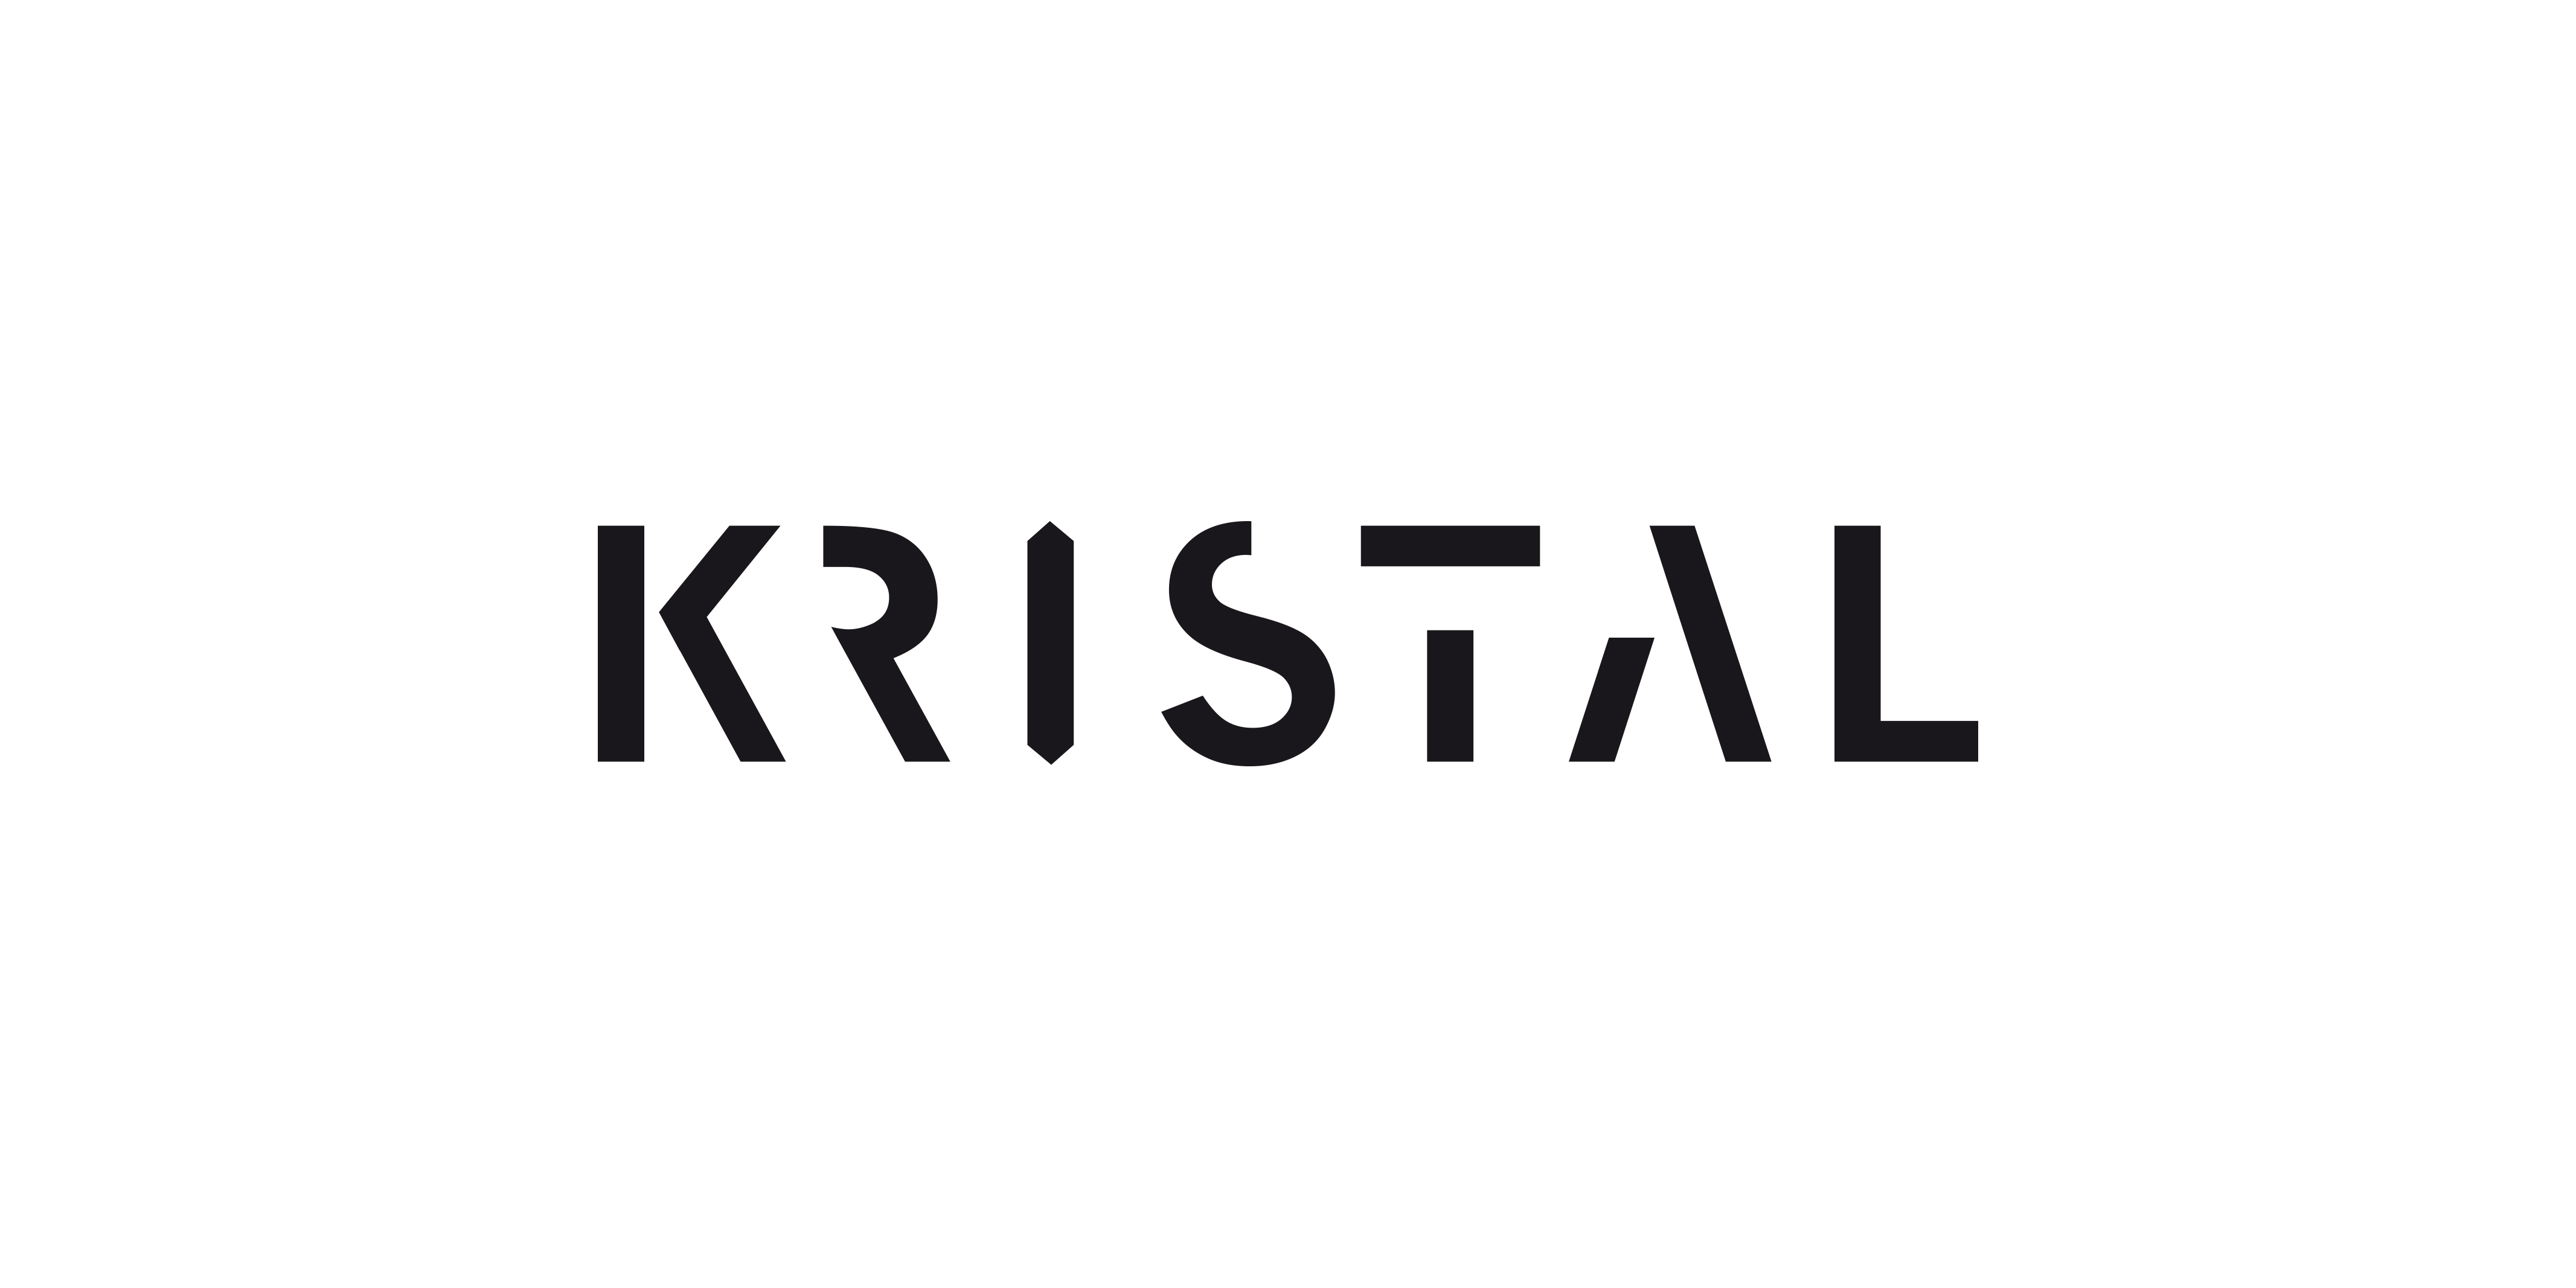 Kristal logo Fitfair Jaarbeurs